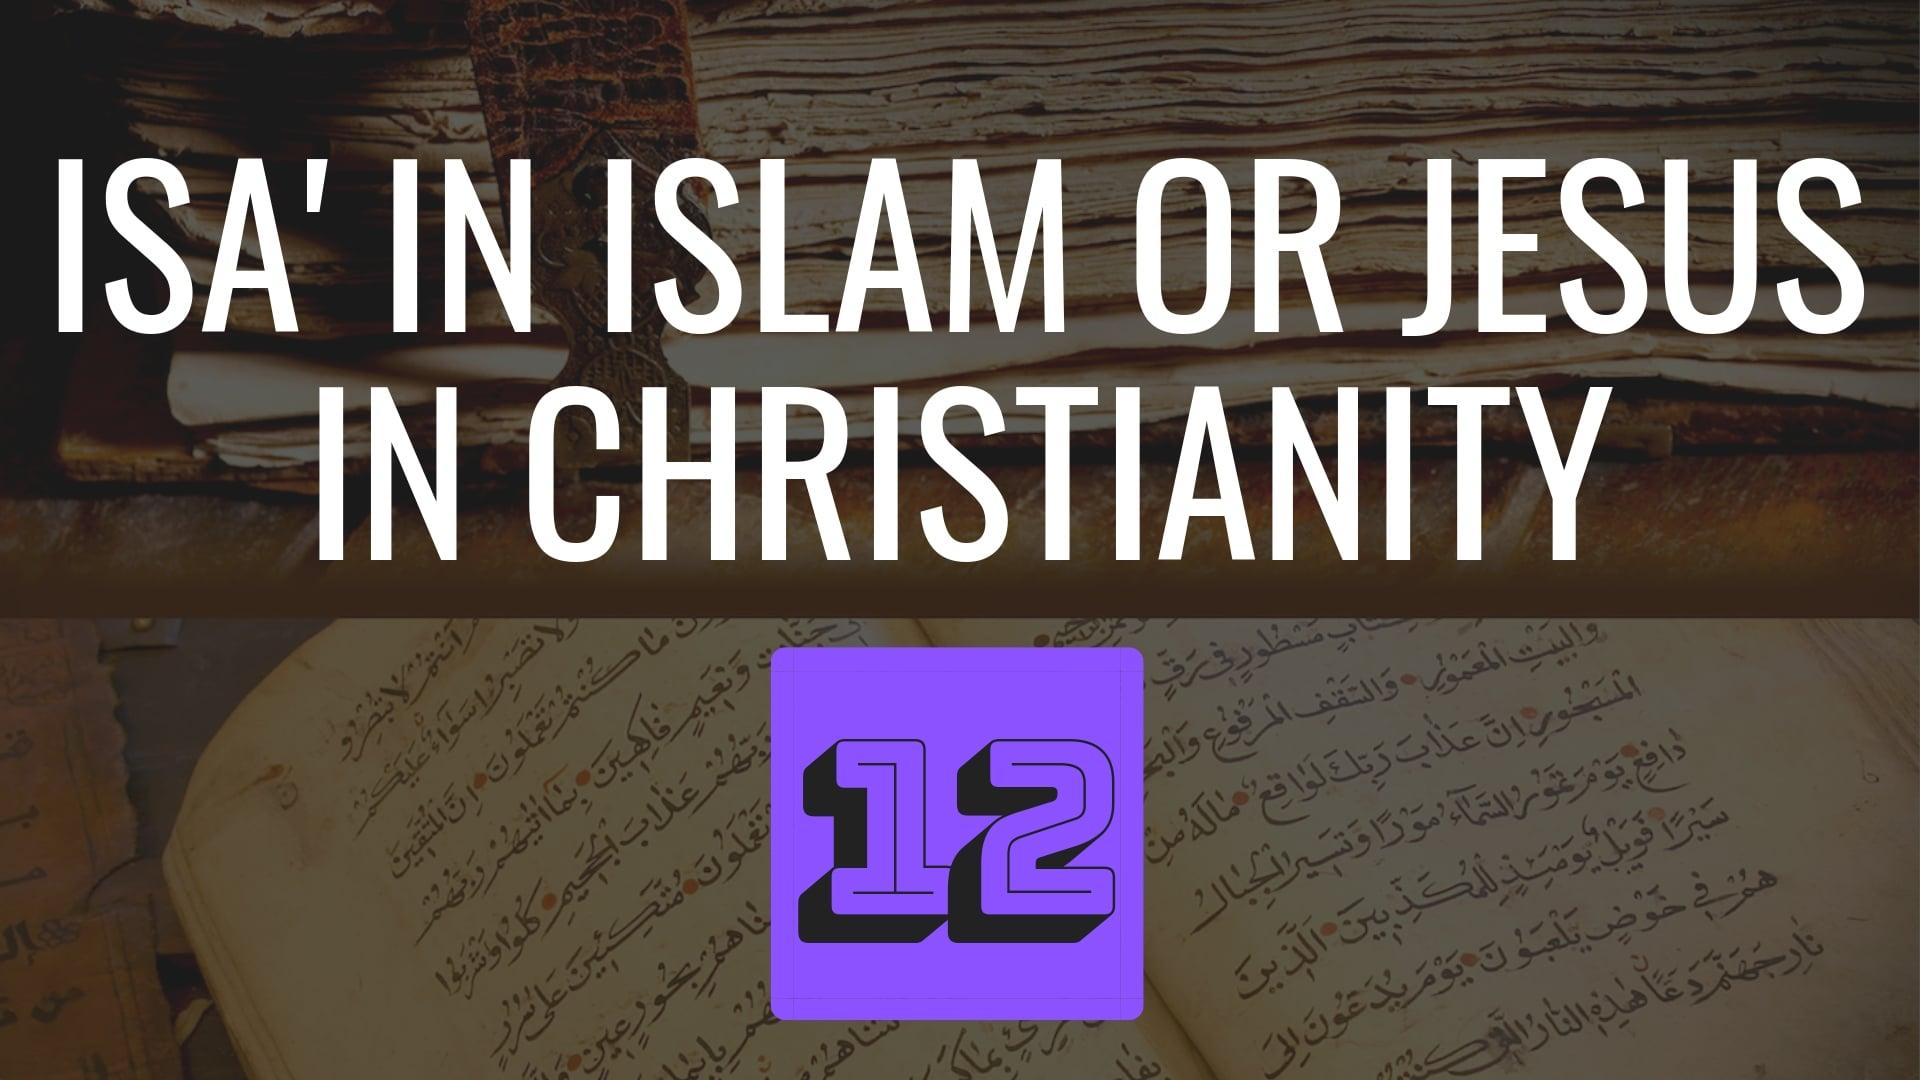 'Isa in Islam or Jesus in Christianity? – Dr. Joshua LIngel